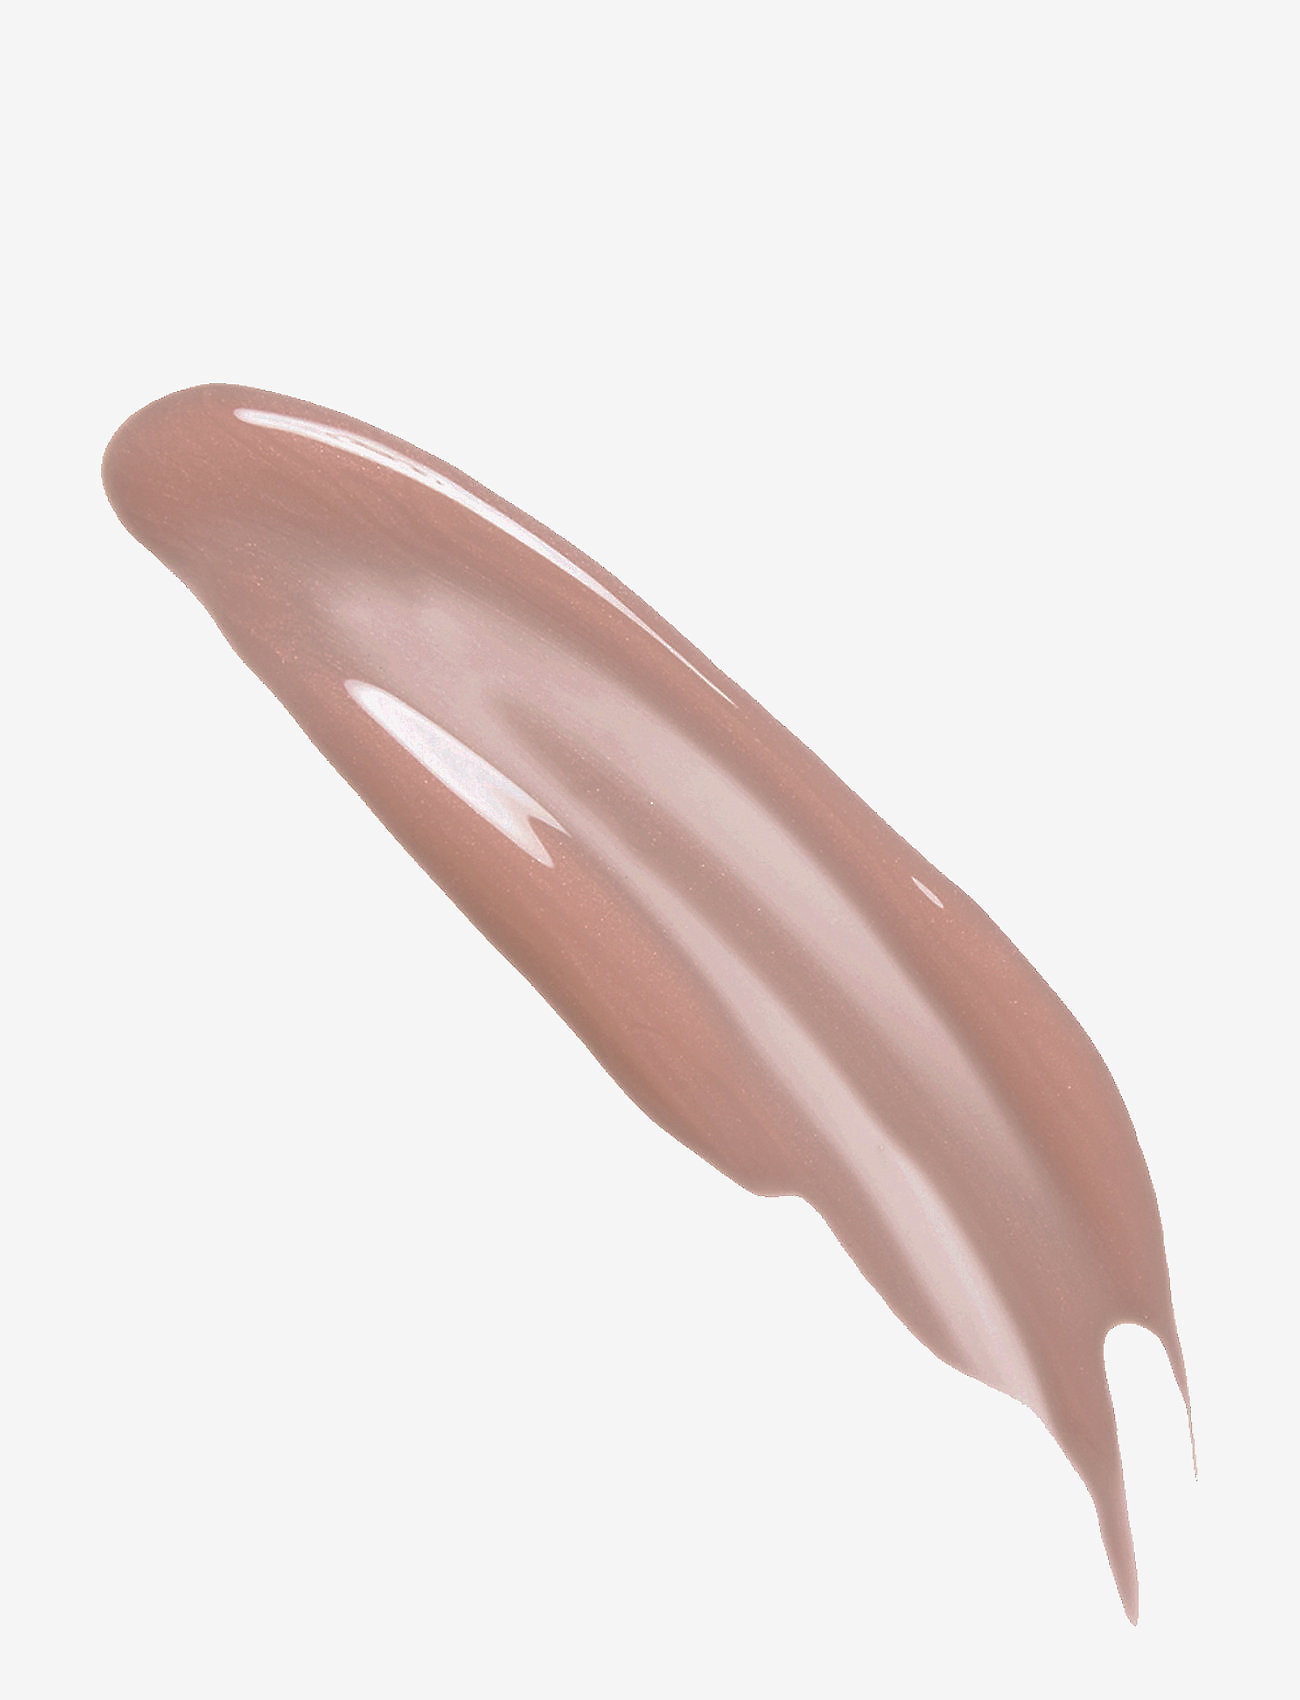 Clarins - INSTANT LIGHT LIP PERFECTOR06 ROSEWOOD - läppglans - 06 rosewood - 1